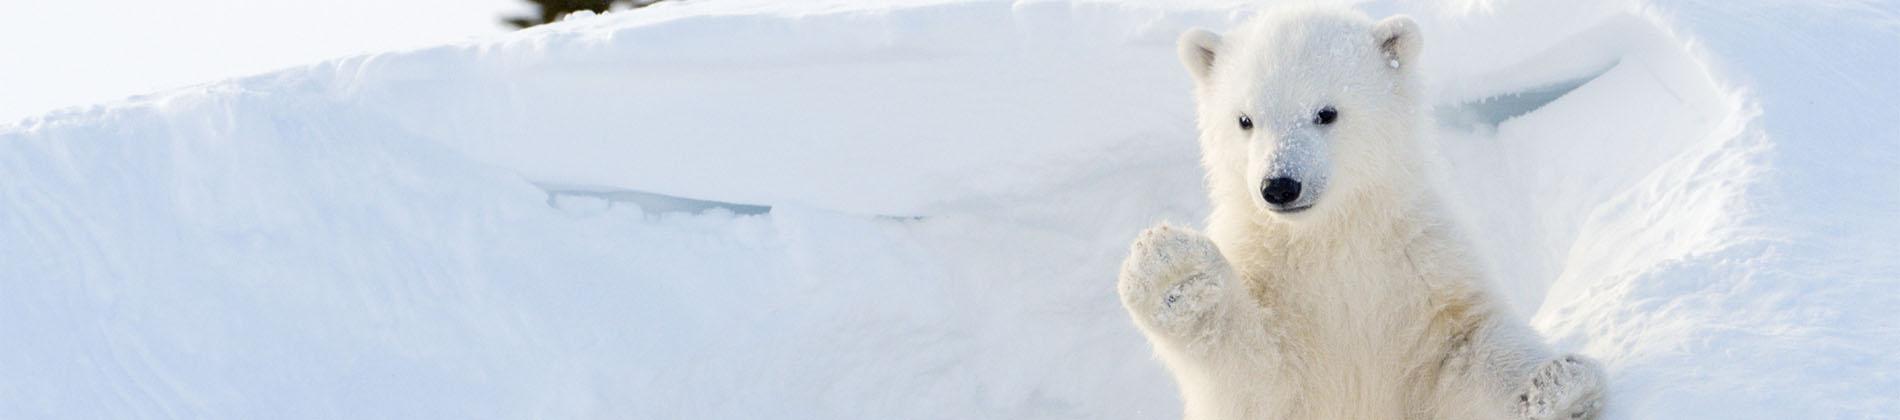 Polar-Bear-Web-Slider